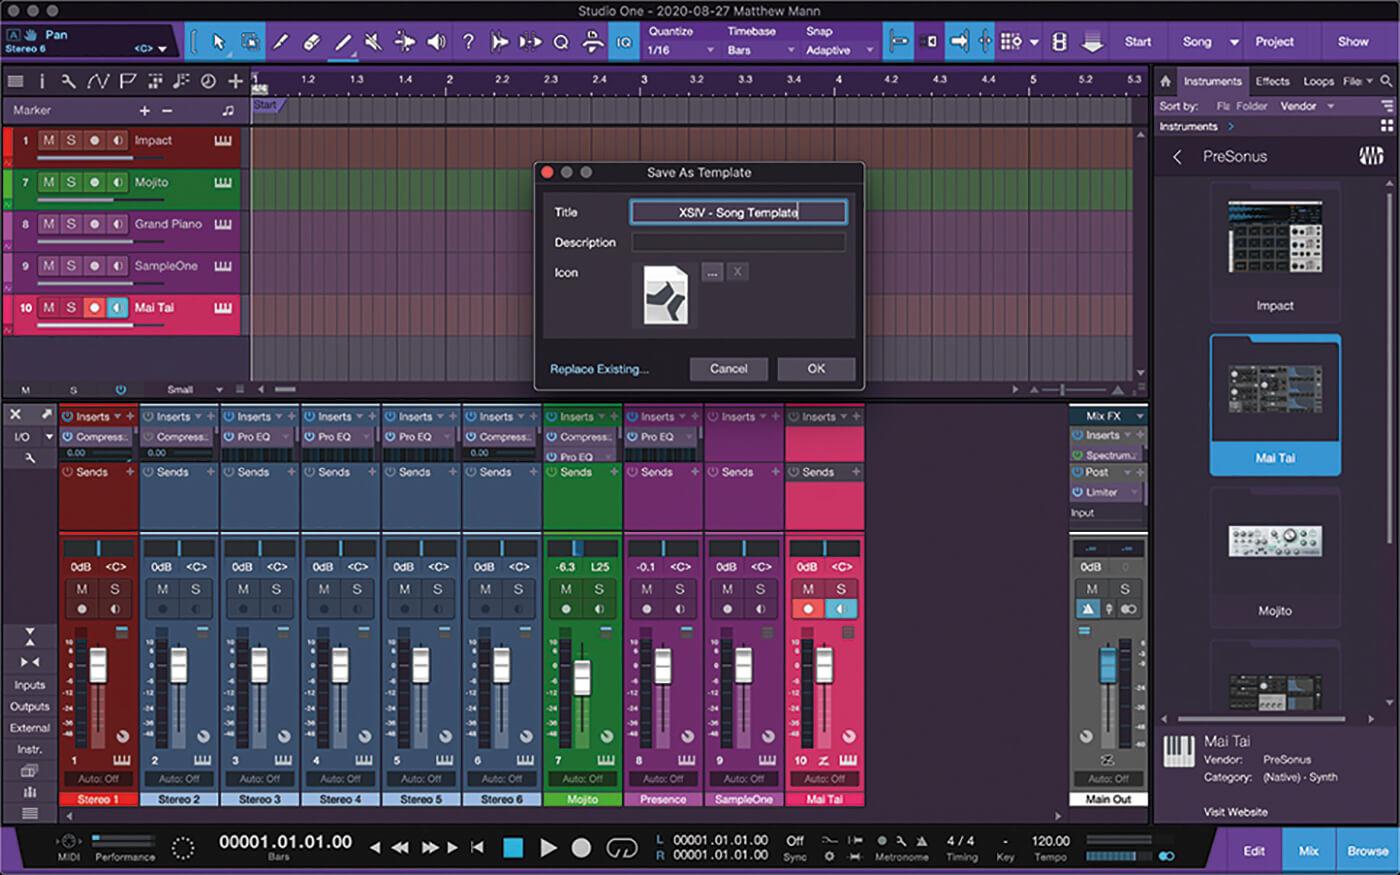 MT211 Studio One 5 Tips 11